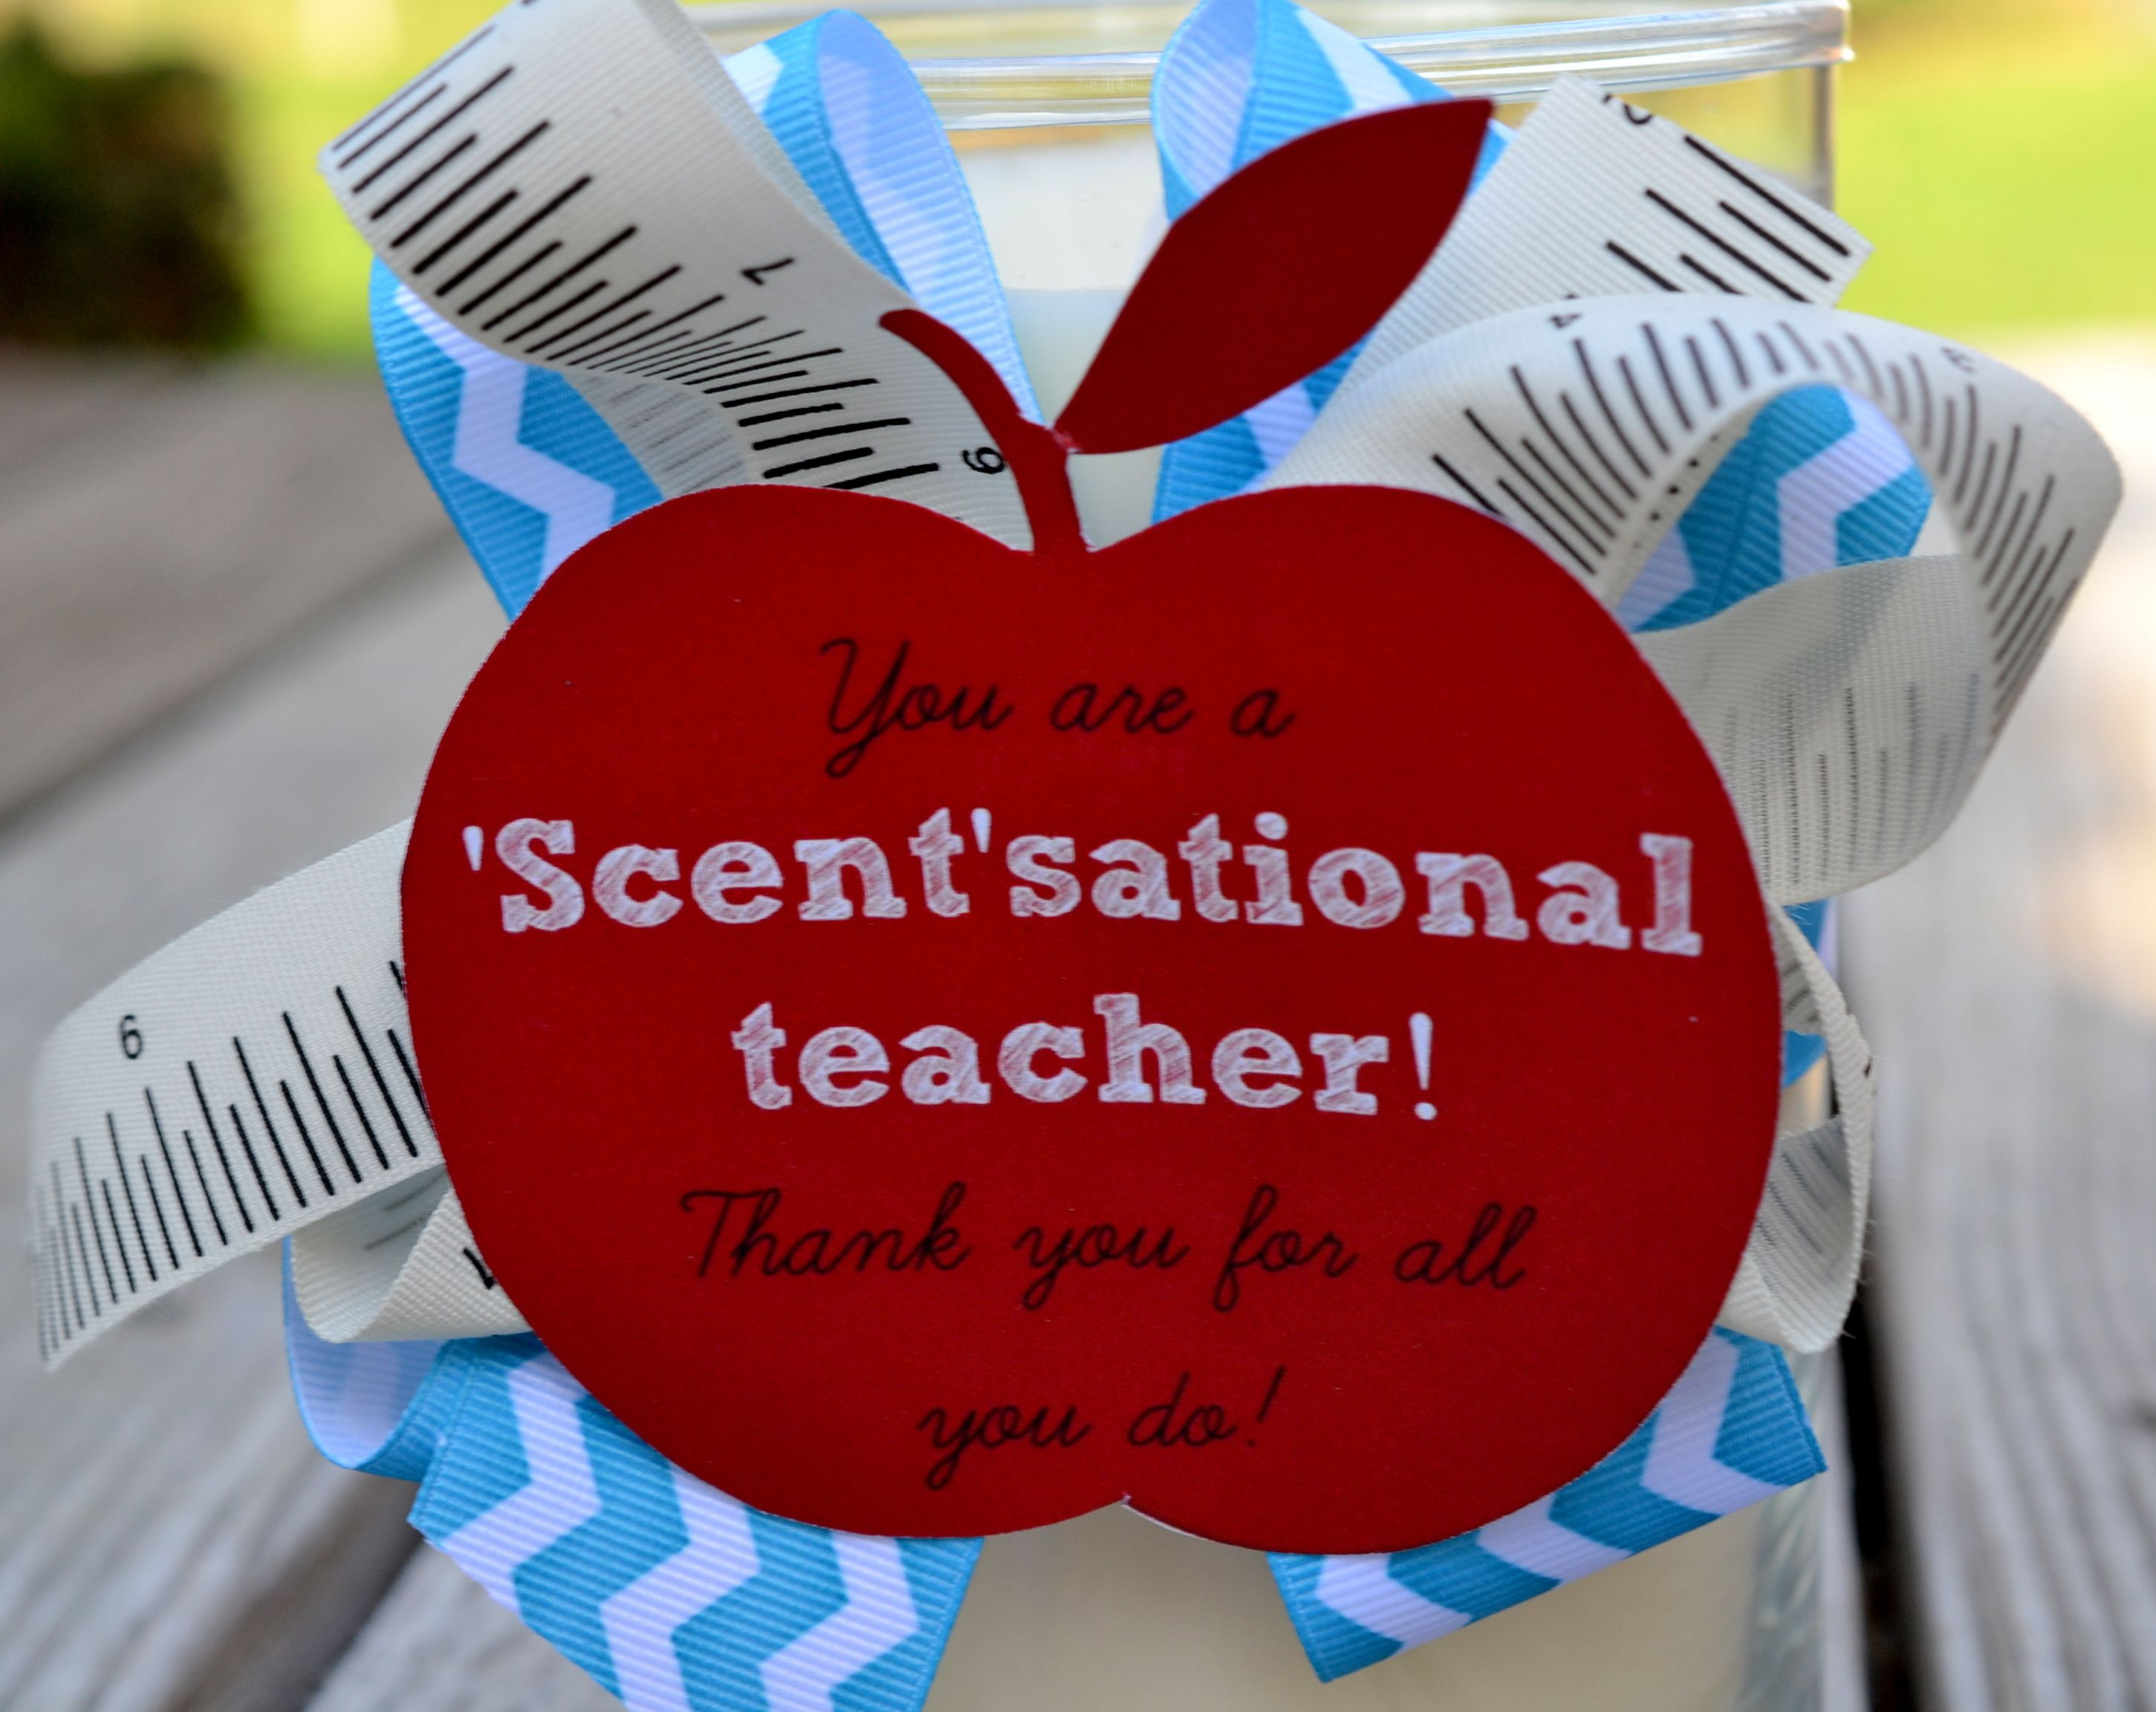 Teacher Appreciation Gift Idea: Candles & Candle Warmers (Plus A - Scentsational Teacher Free Printable